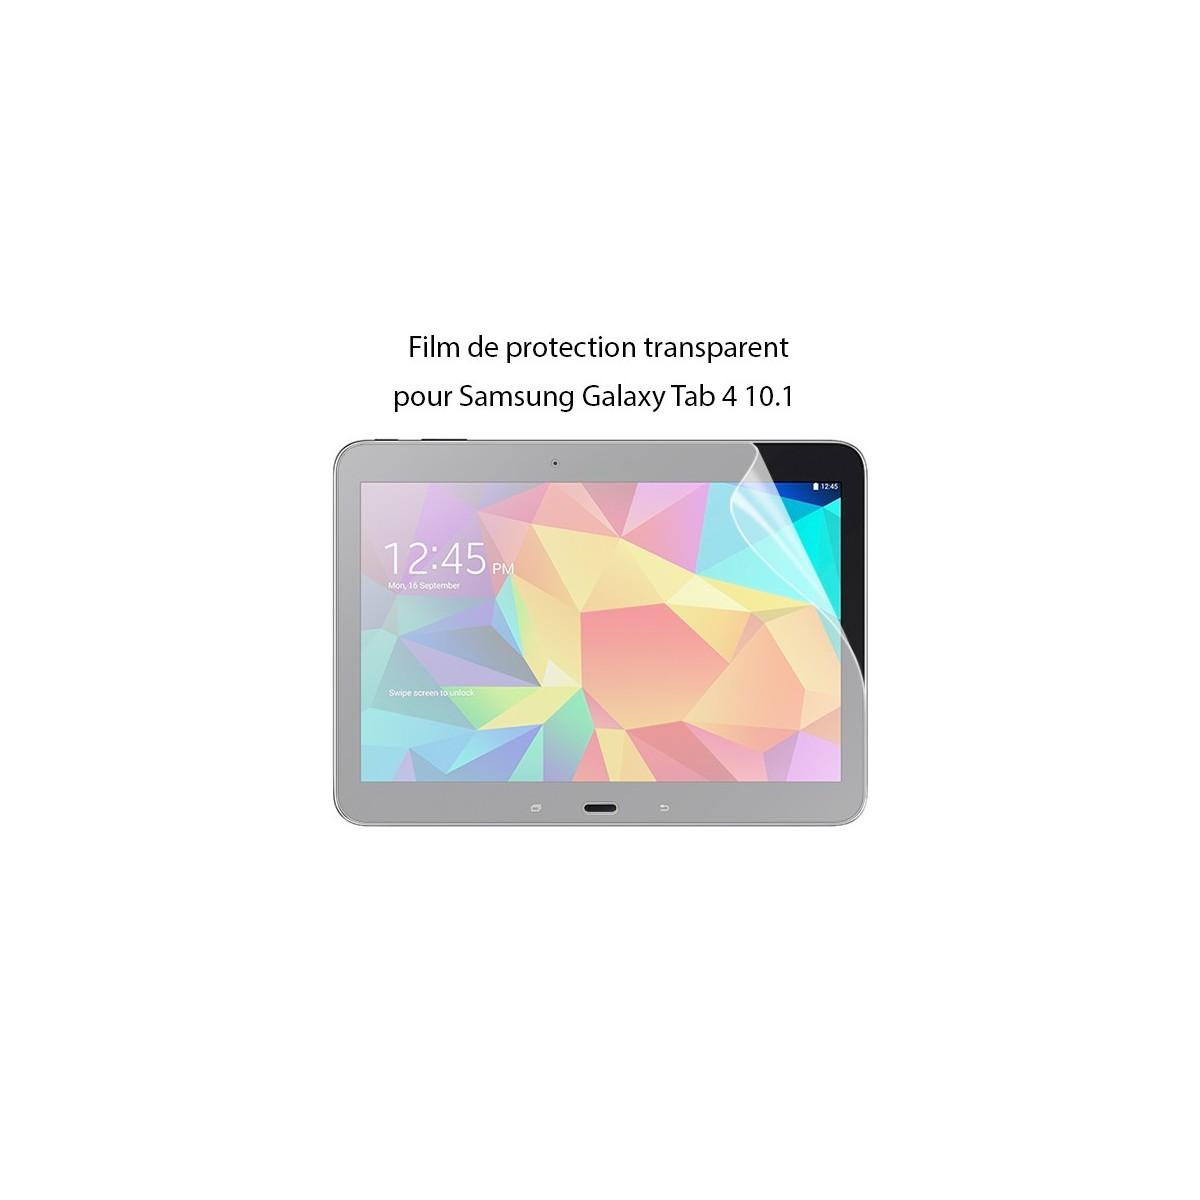 Film Galaxy Tab 4 10.1 protection transparent